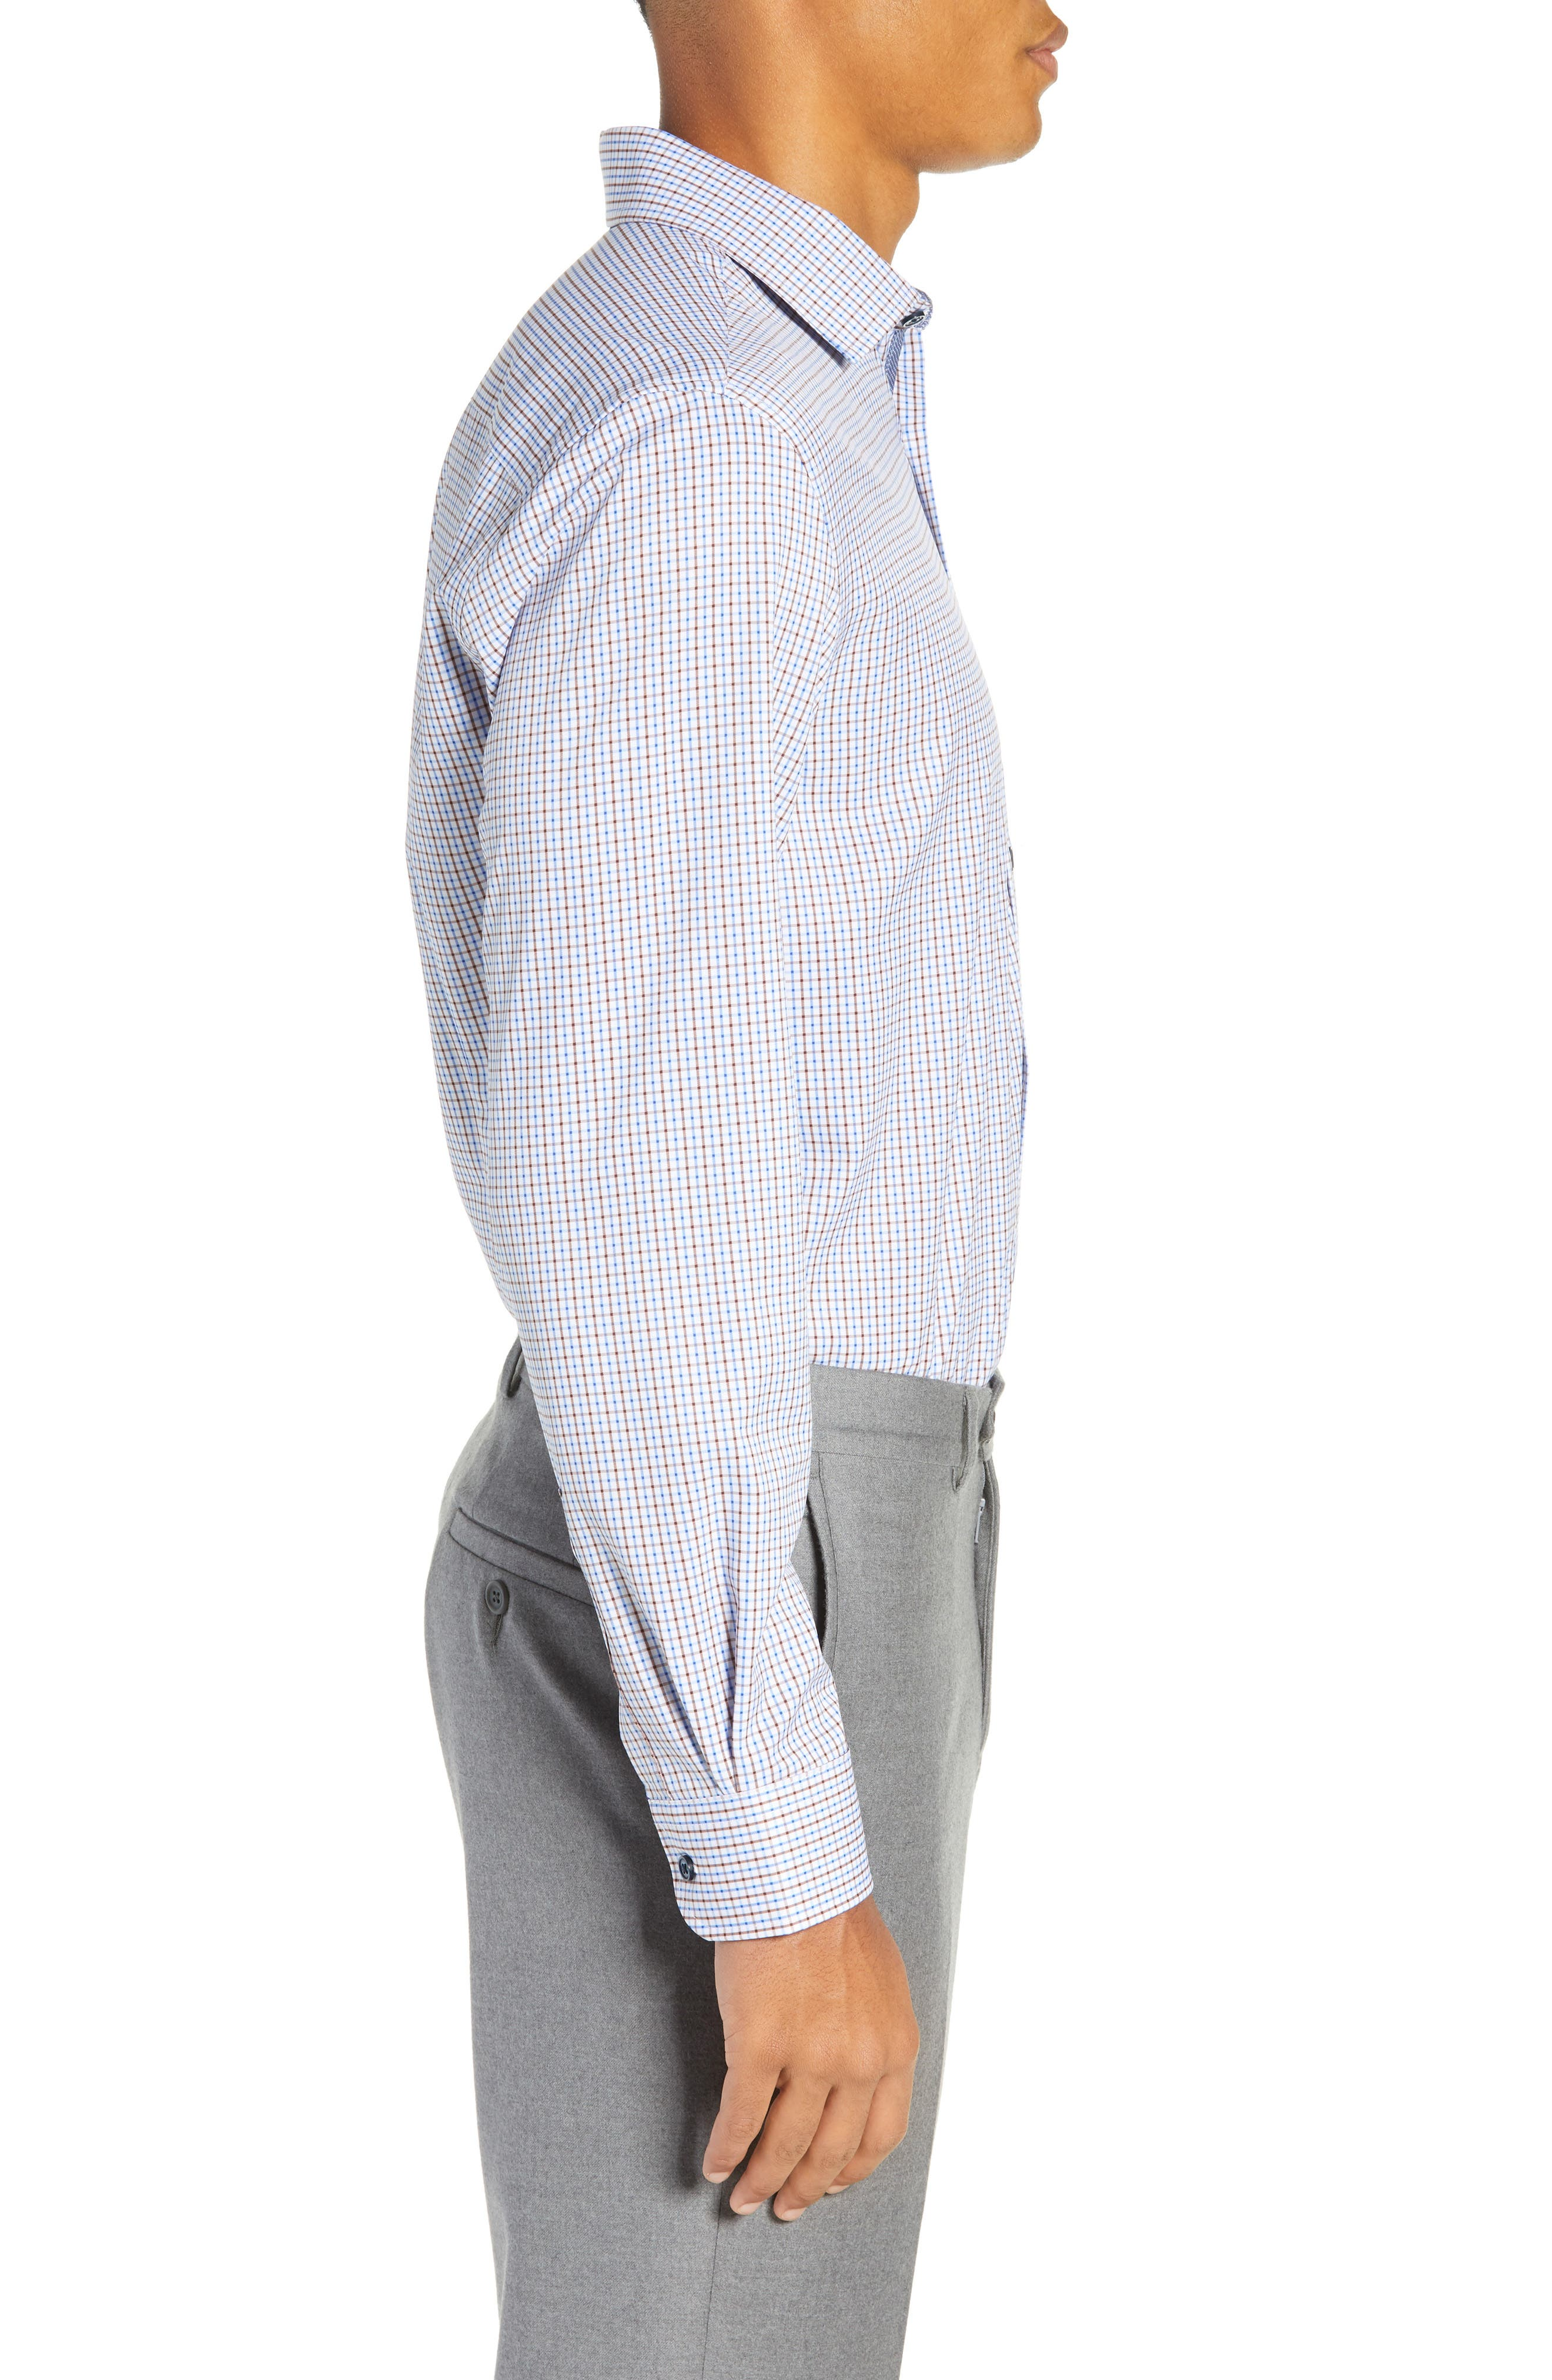 Trim Fit 4-Way Stretch Check Dress Shirt,                             Alternate thumbnail 4, color,                             BLUE